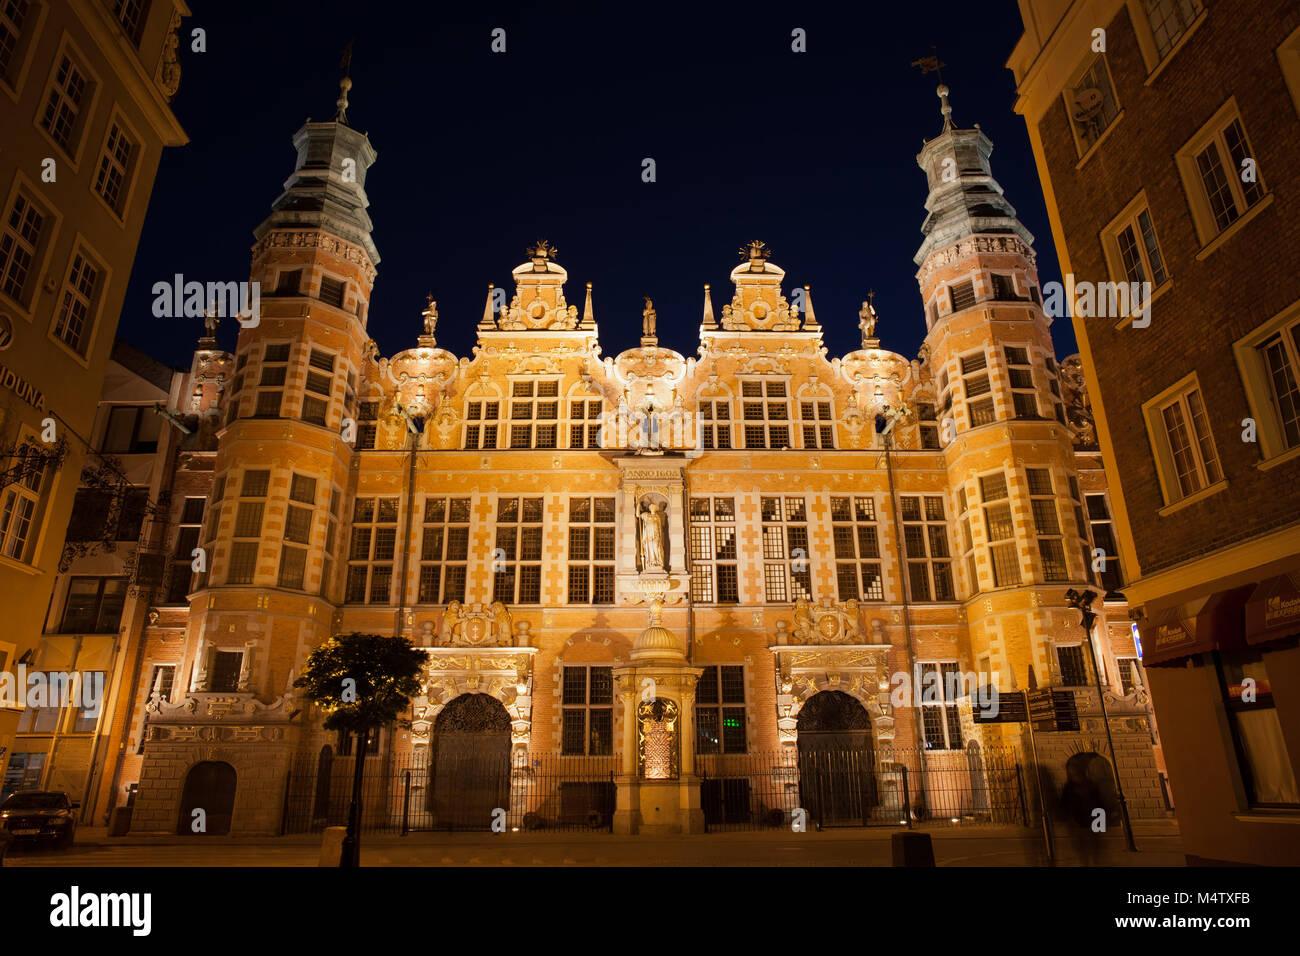 The Great Armoury - Grand Armoury (Wielka Zbrojownia) illuminated at night in city of Gdansk, Poland, Europe, Netherlandic - Stock Image